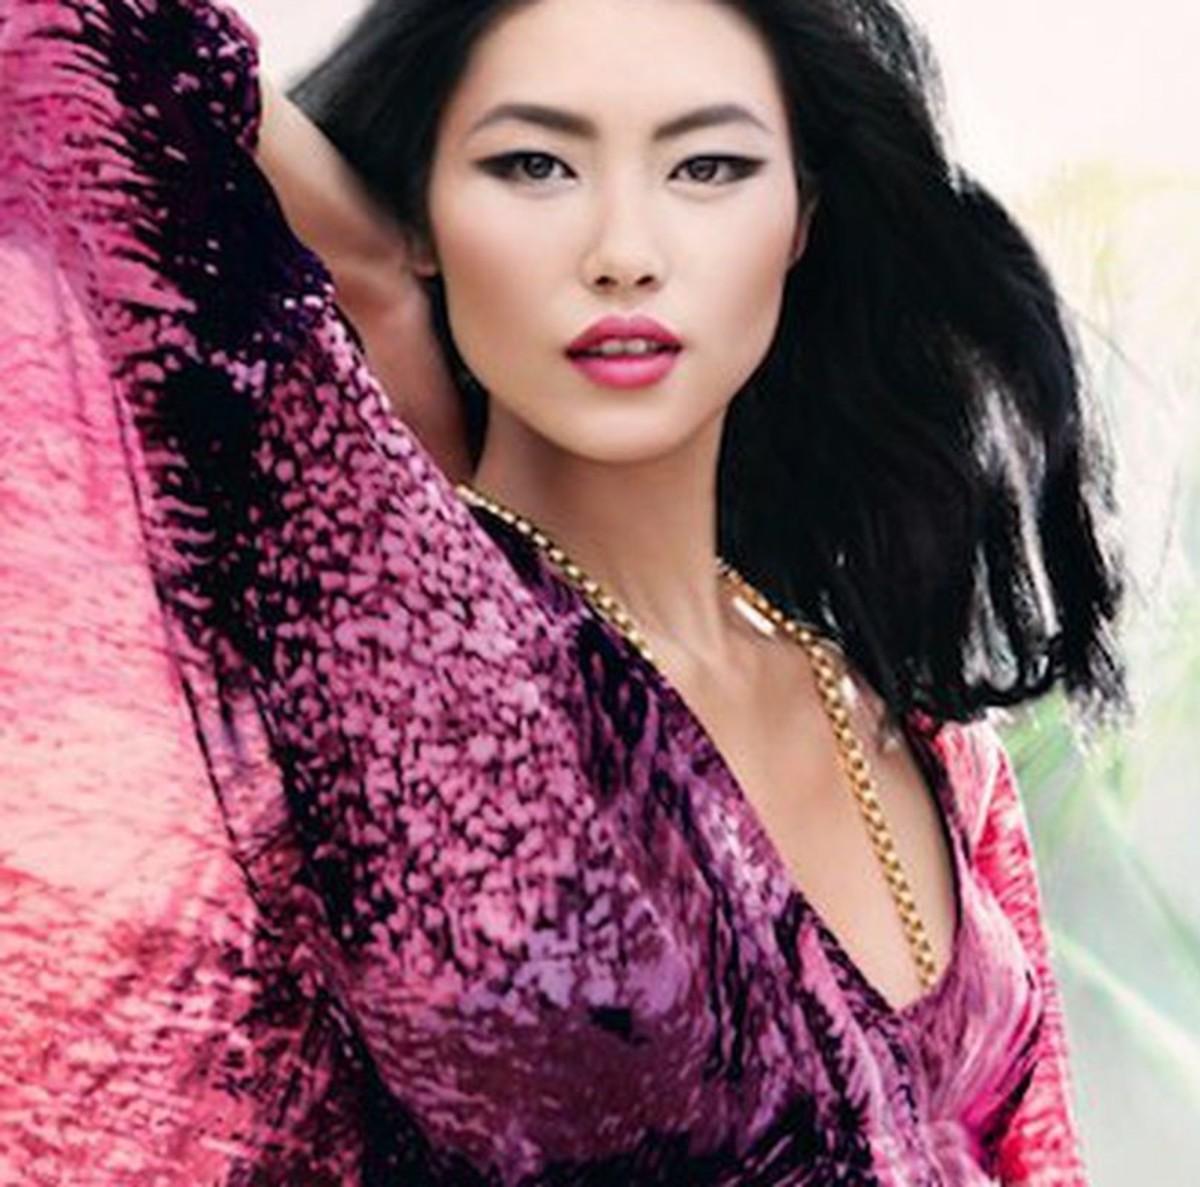 Liu Wen, Chinese Supermodel